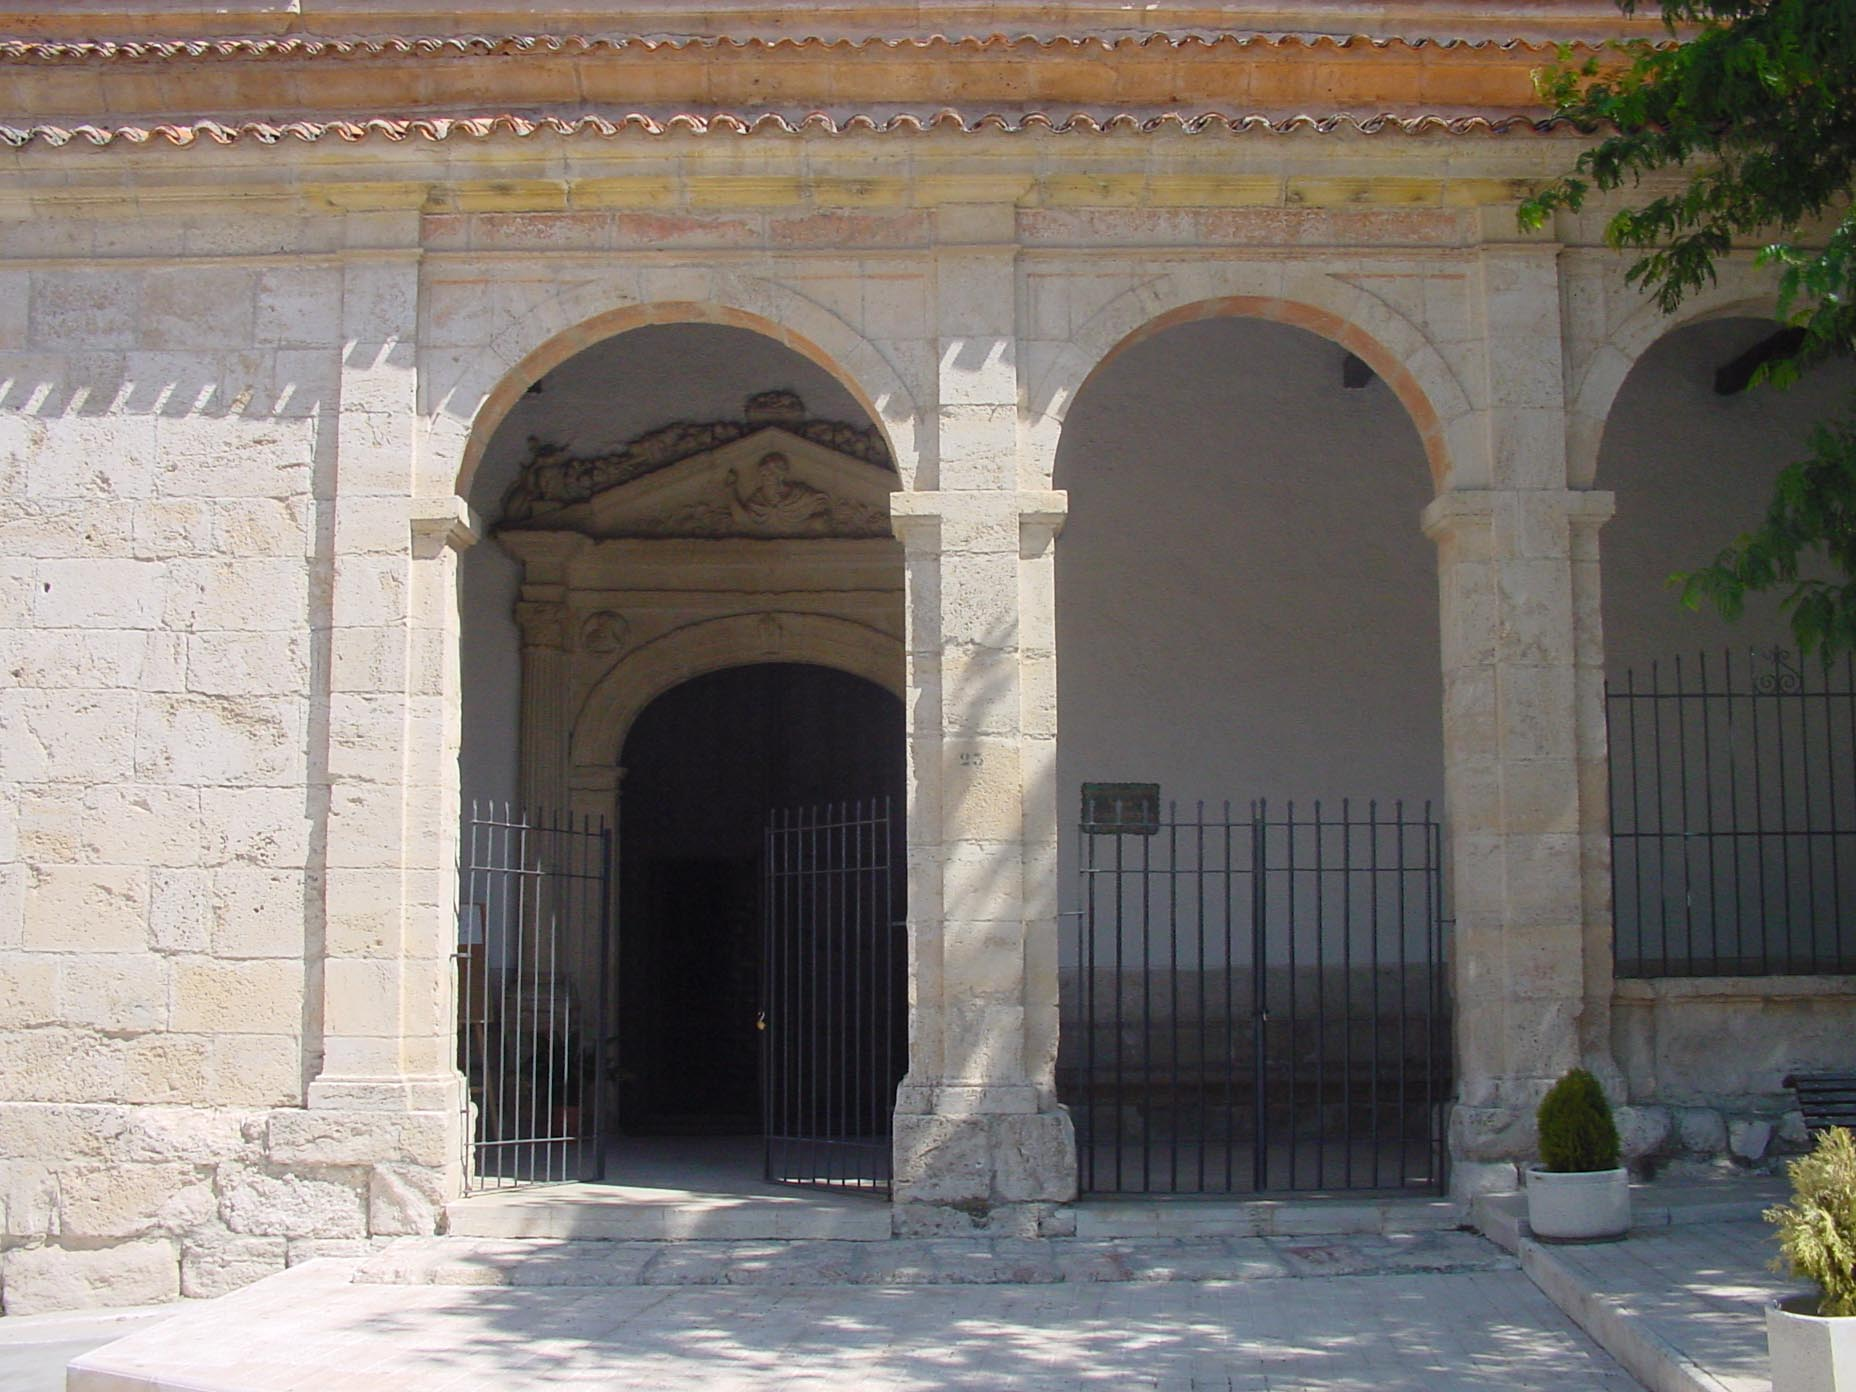 Puerta de iglesia en Villalbilla